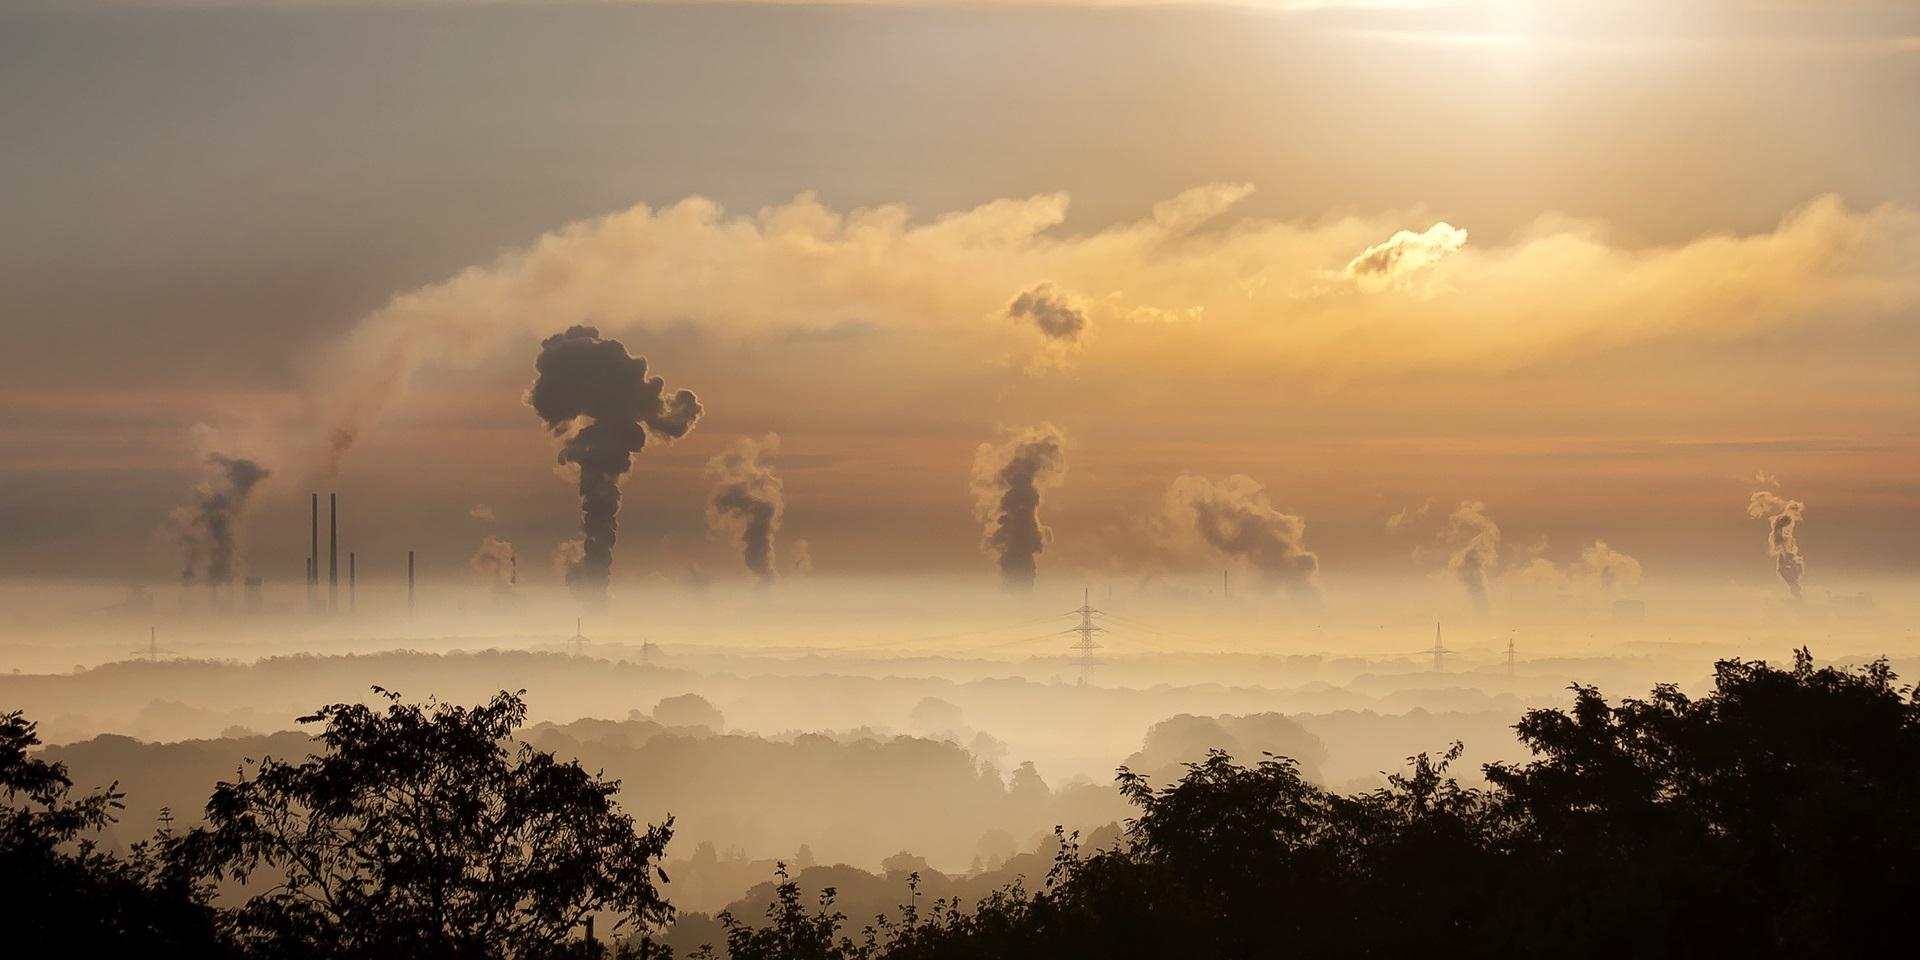 Australian bushfires help push forecast 2020 CO₂ rise - Met Office